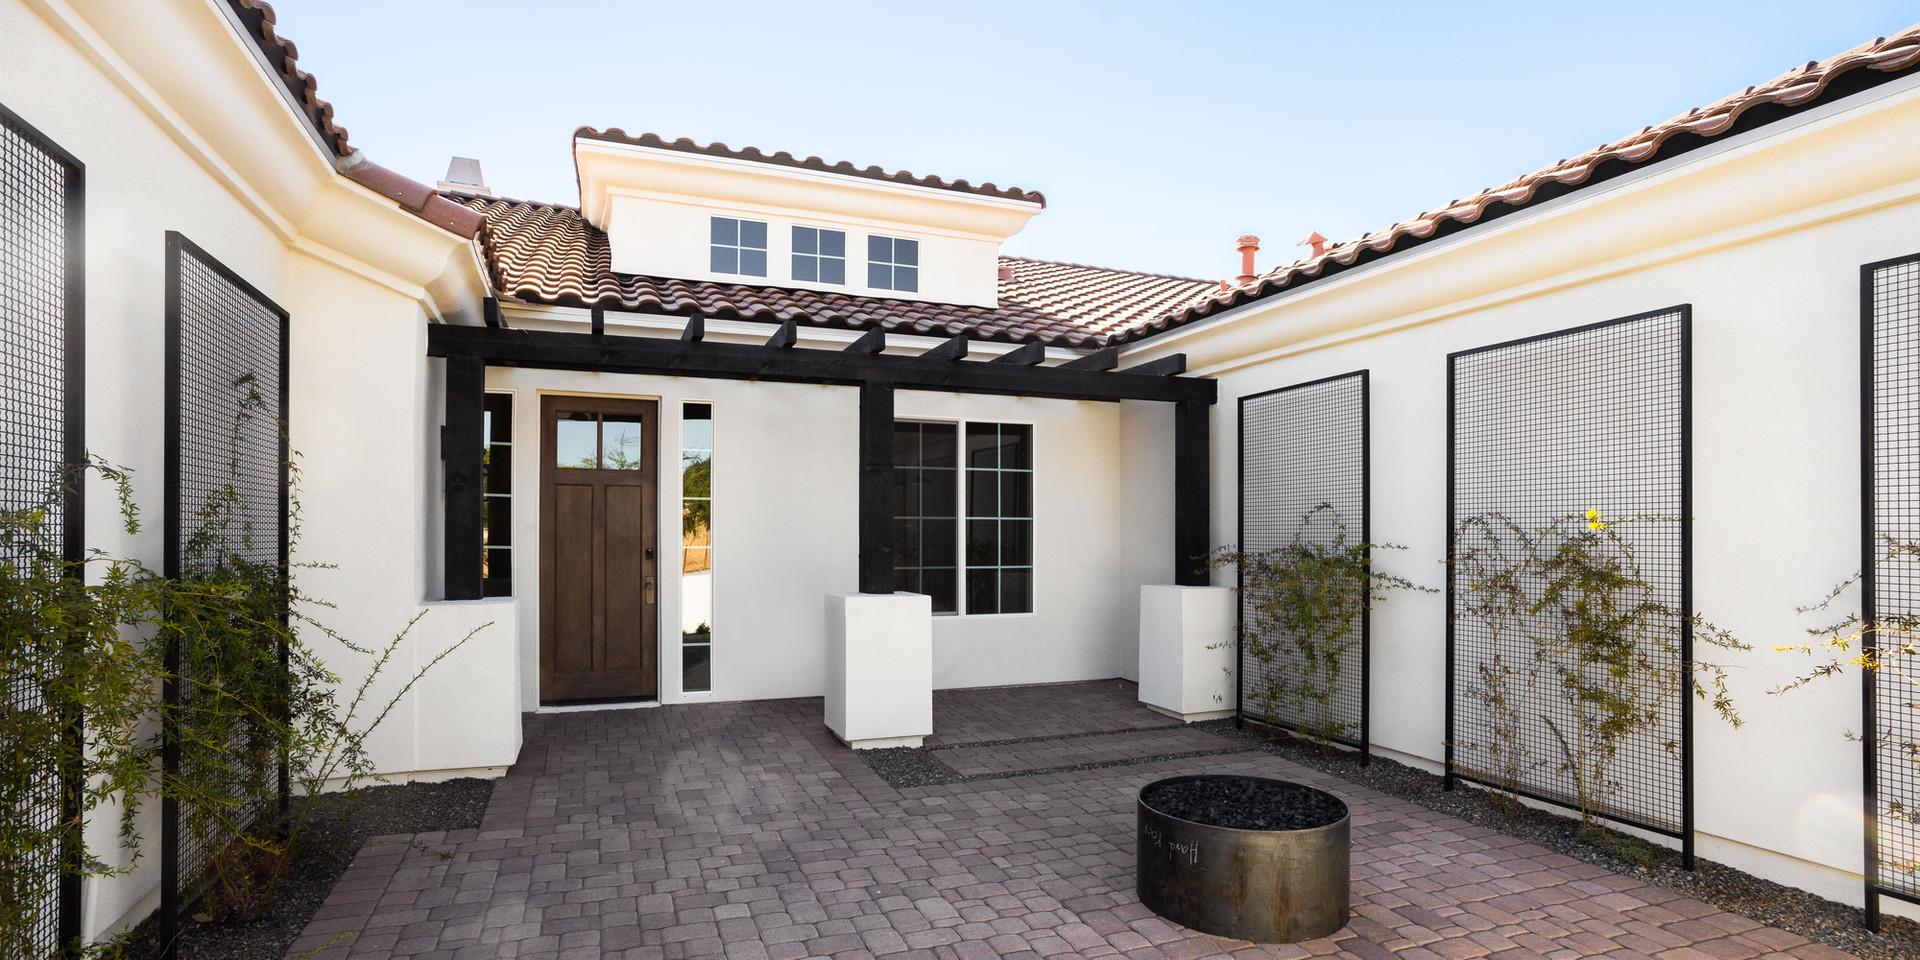 Diller Grove - Front Courtyard